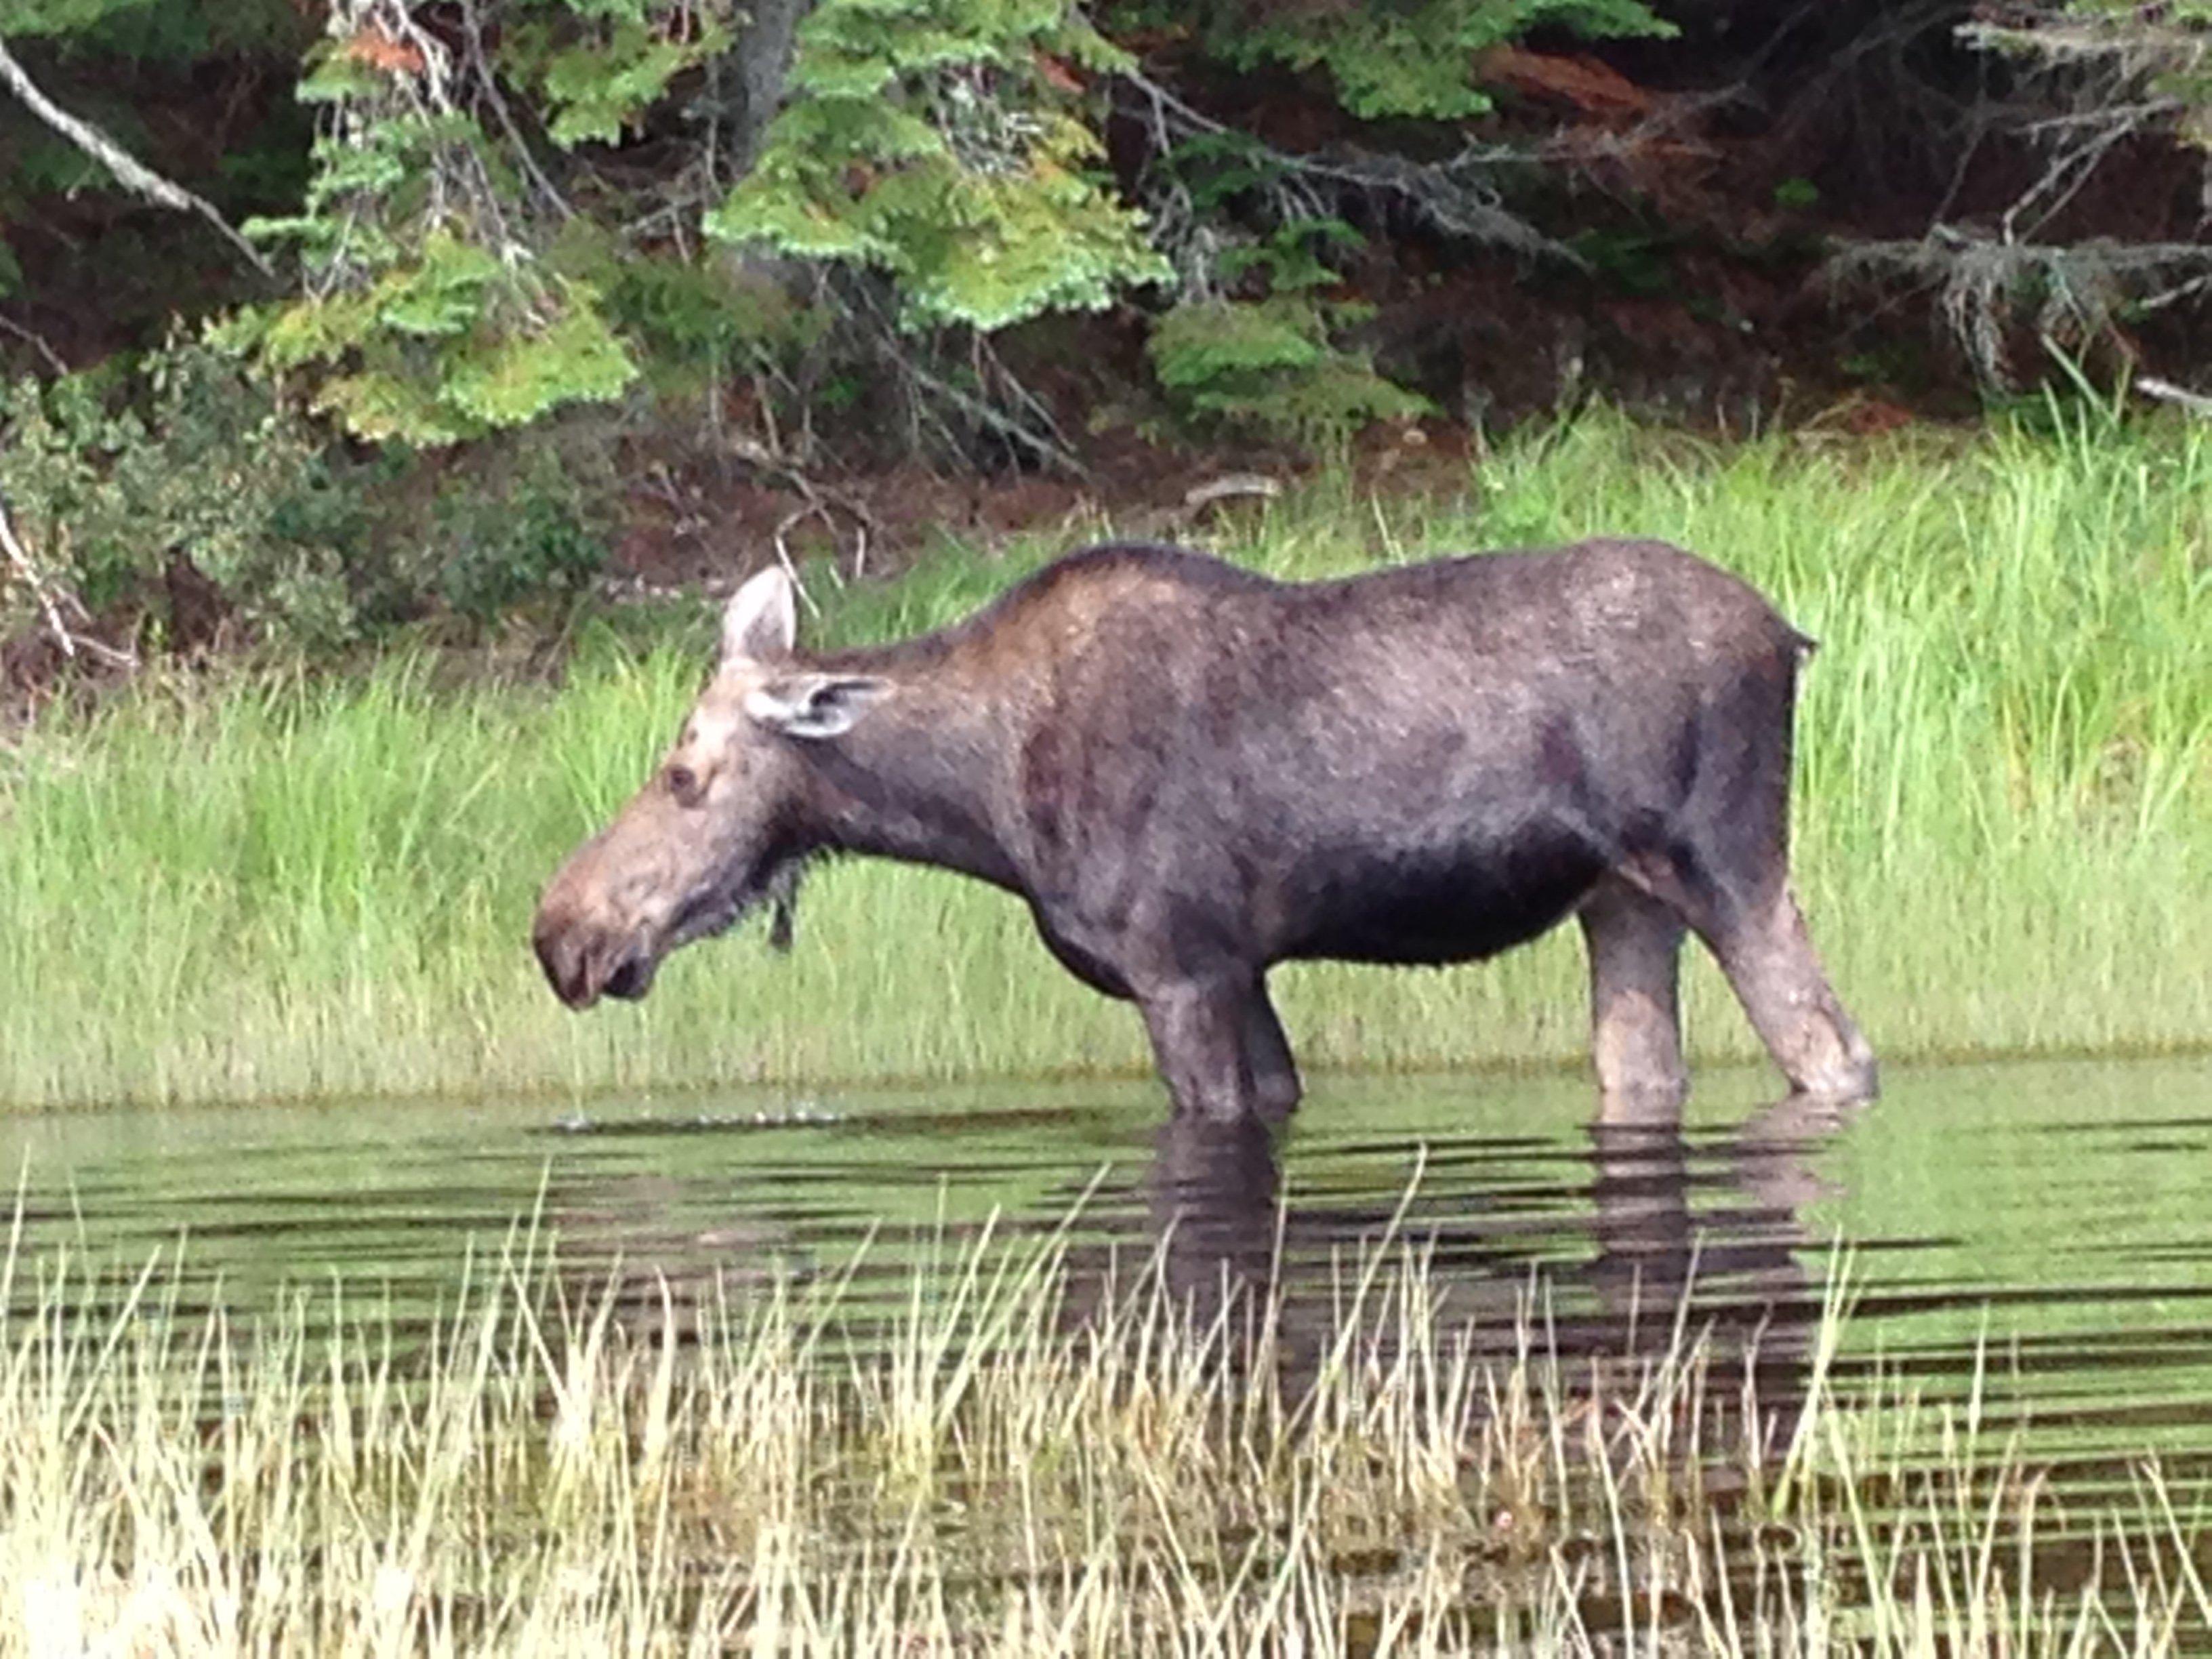 Close moose encounters while kayaking near remote lakes